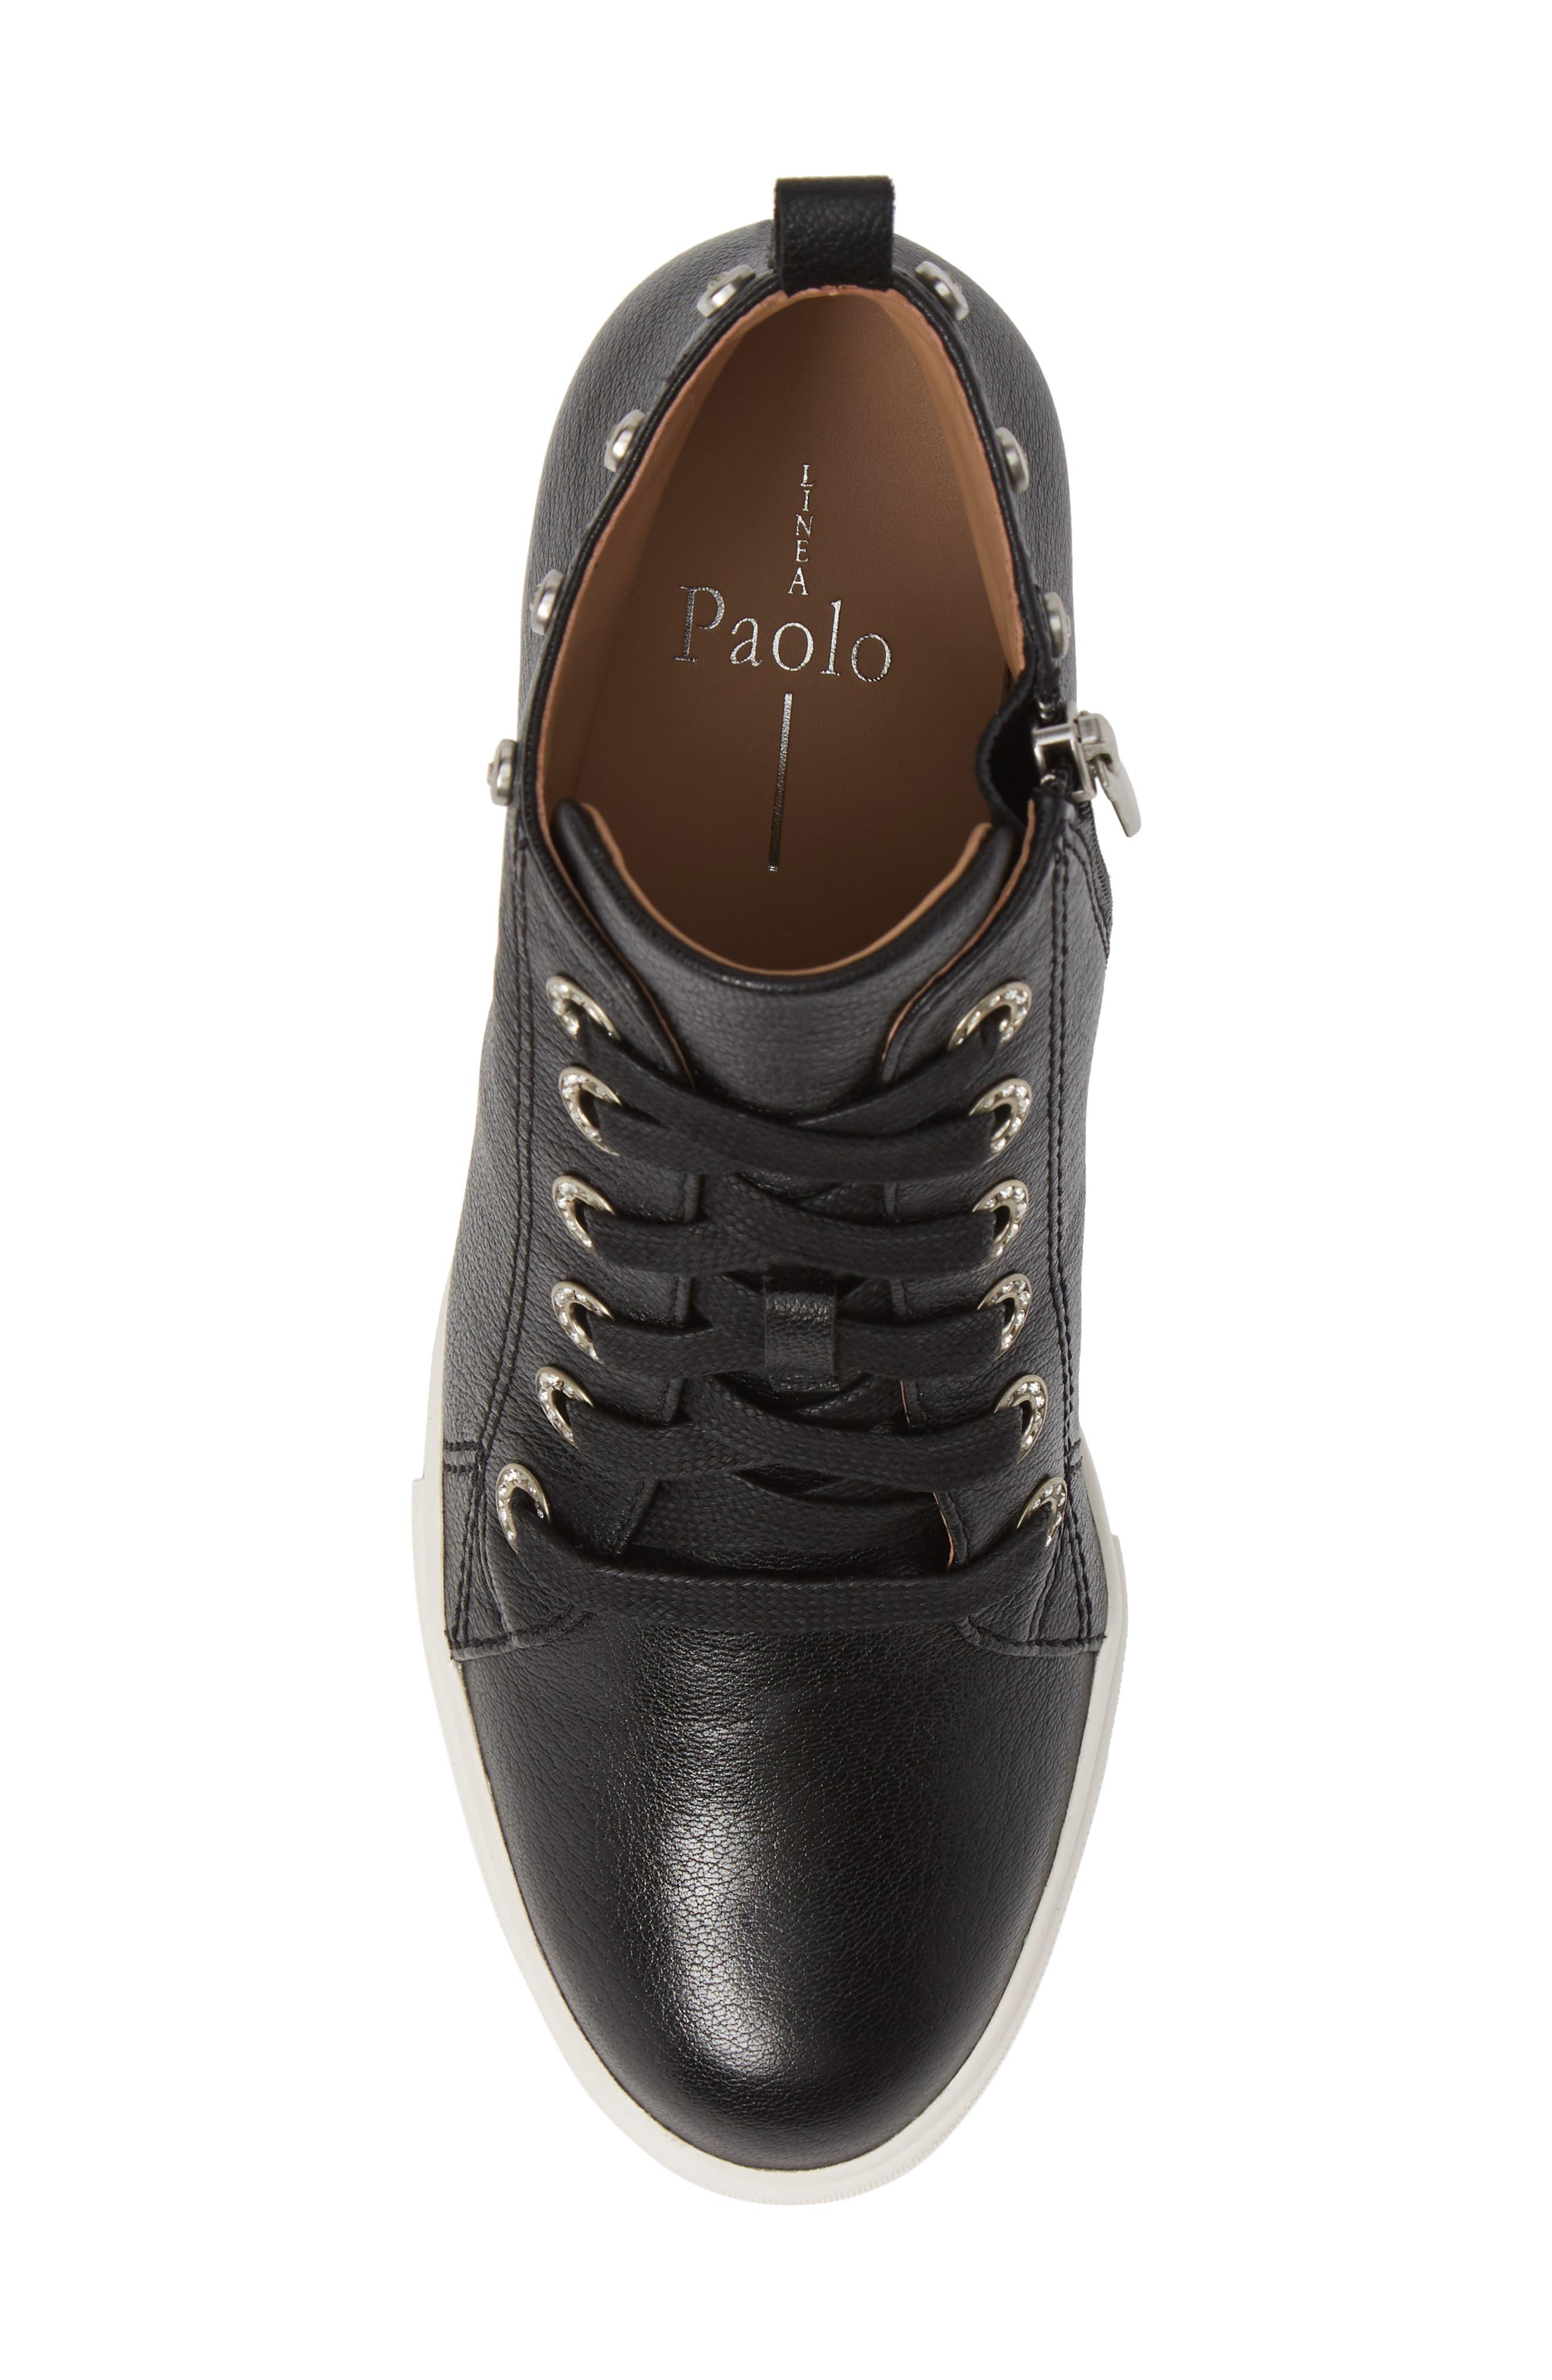 LINEA PAOLO, Flint Wedge Sneaker, Alternate thumbnail 5, color, BLACK LEATHER